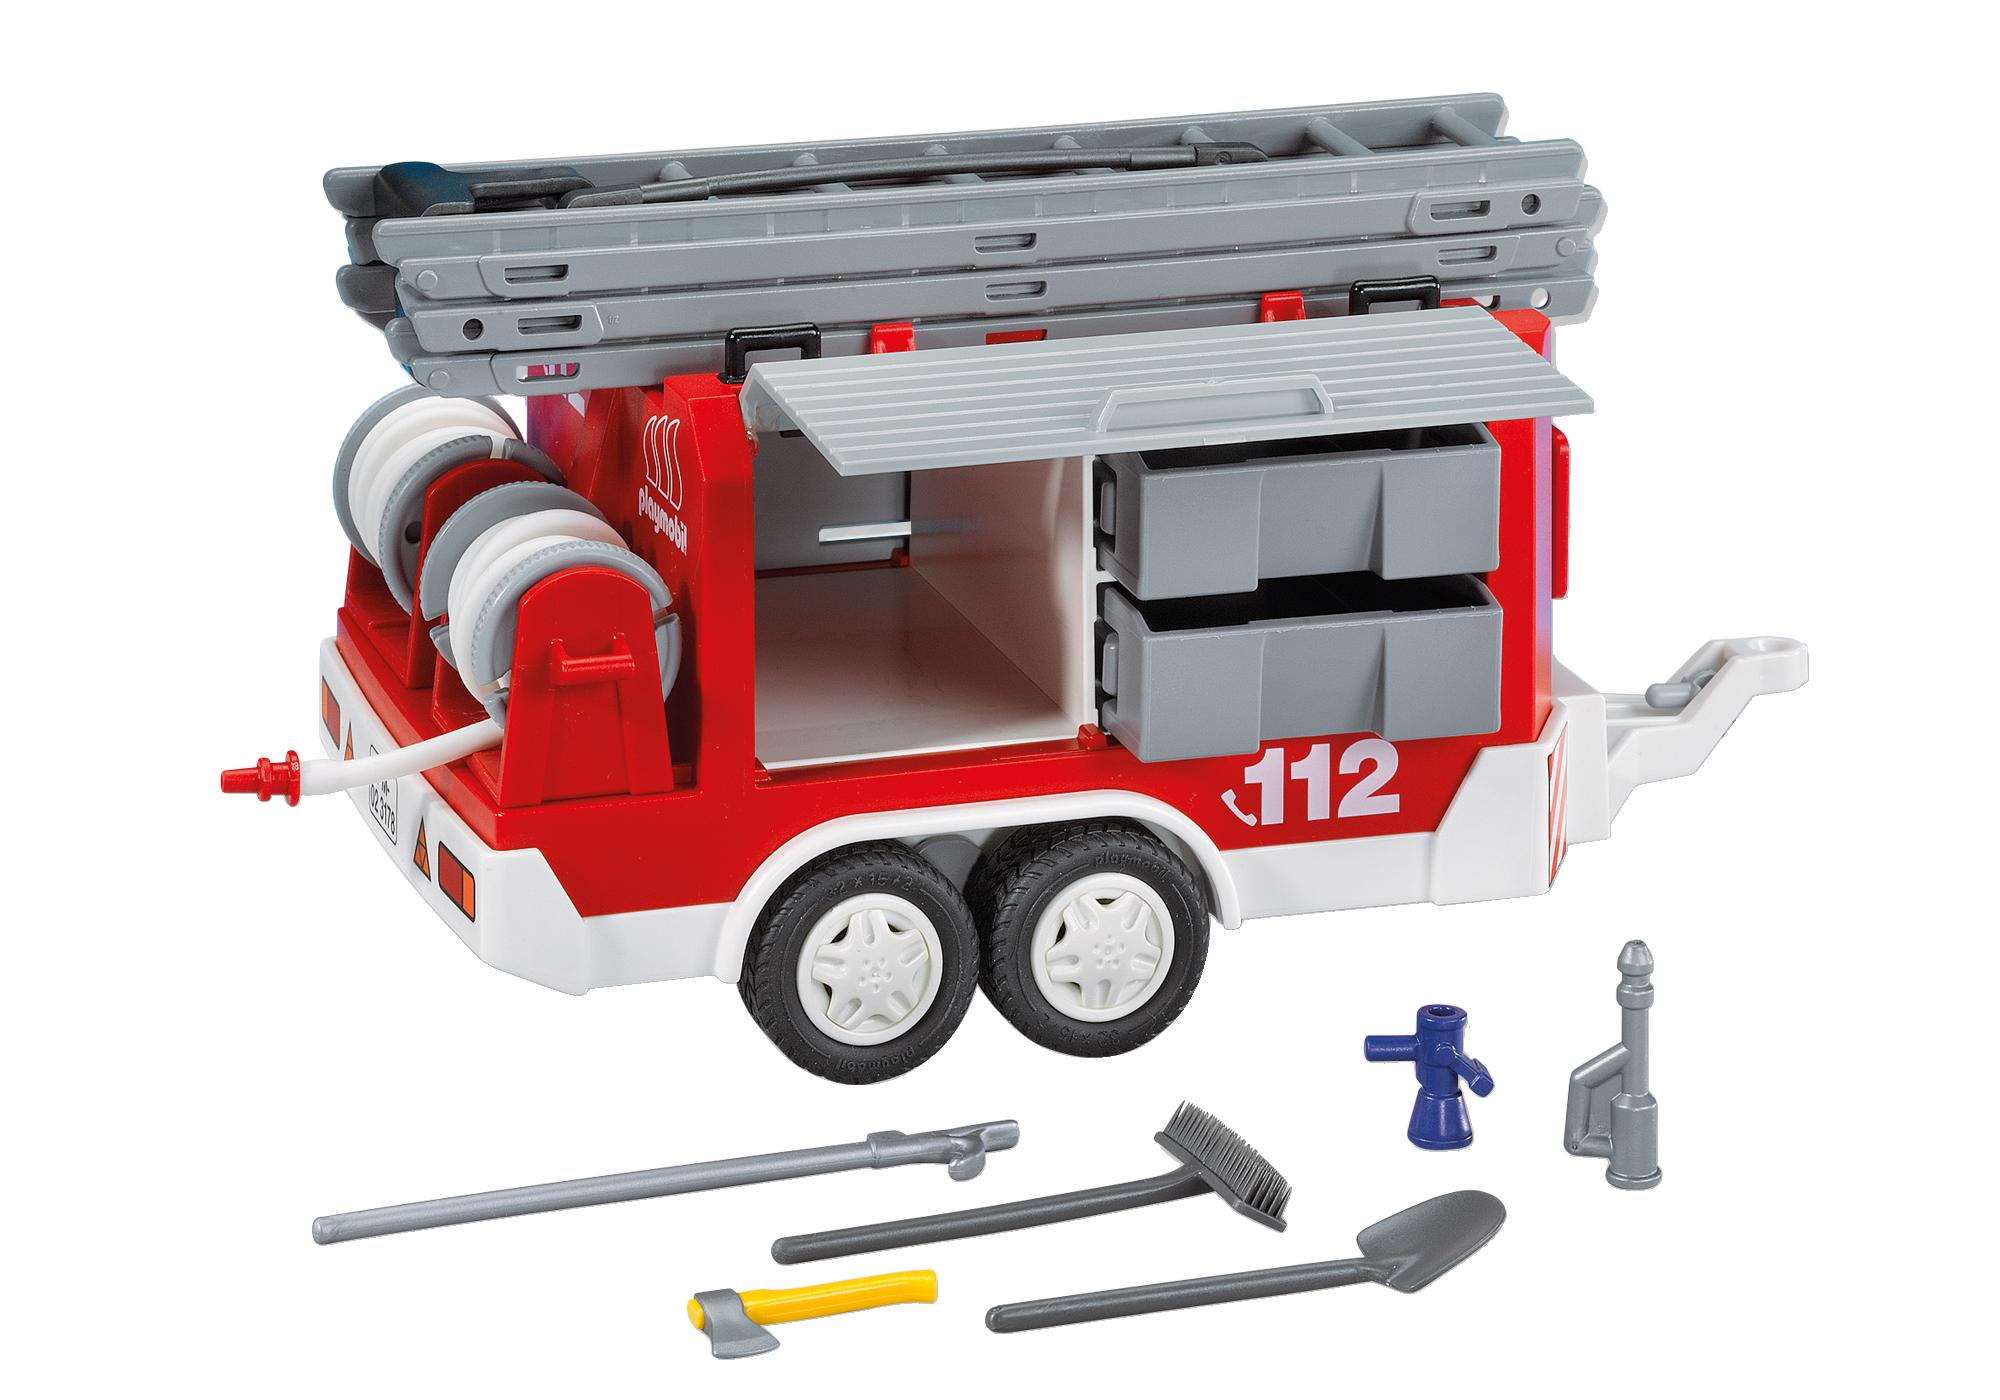 7485_product_detail/Πυροσβεστικό ρυμουλκούμενο όχημα